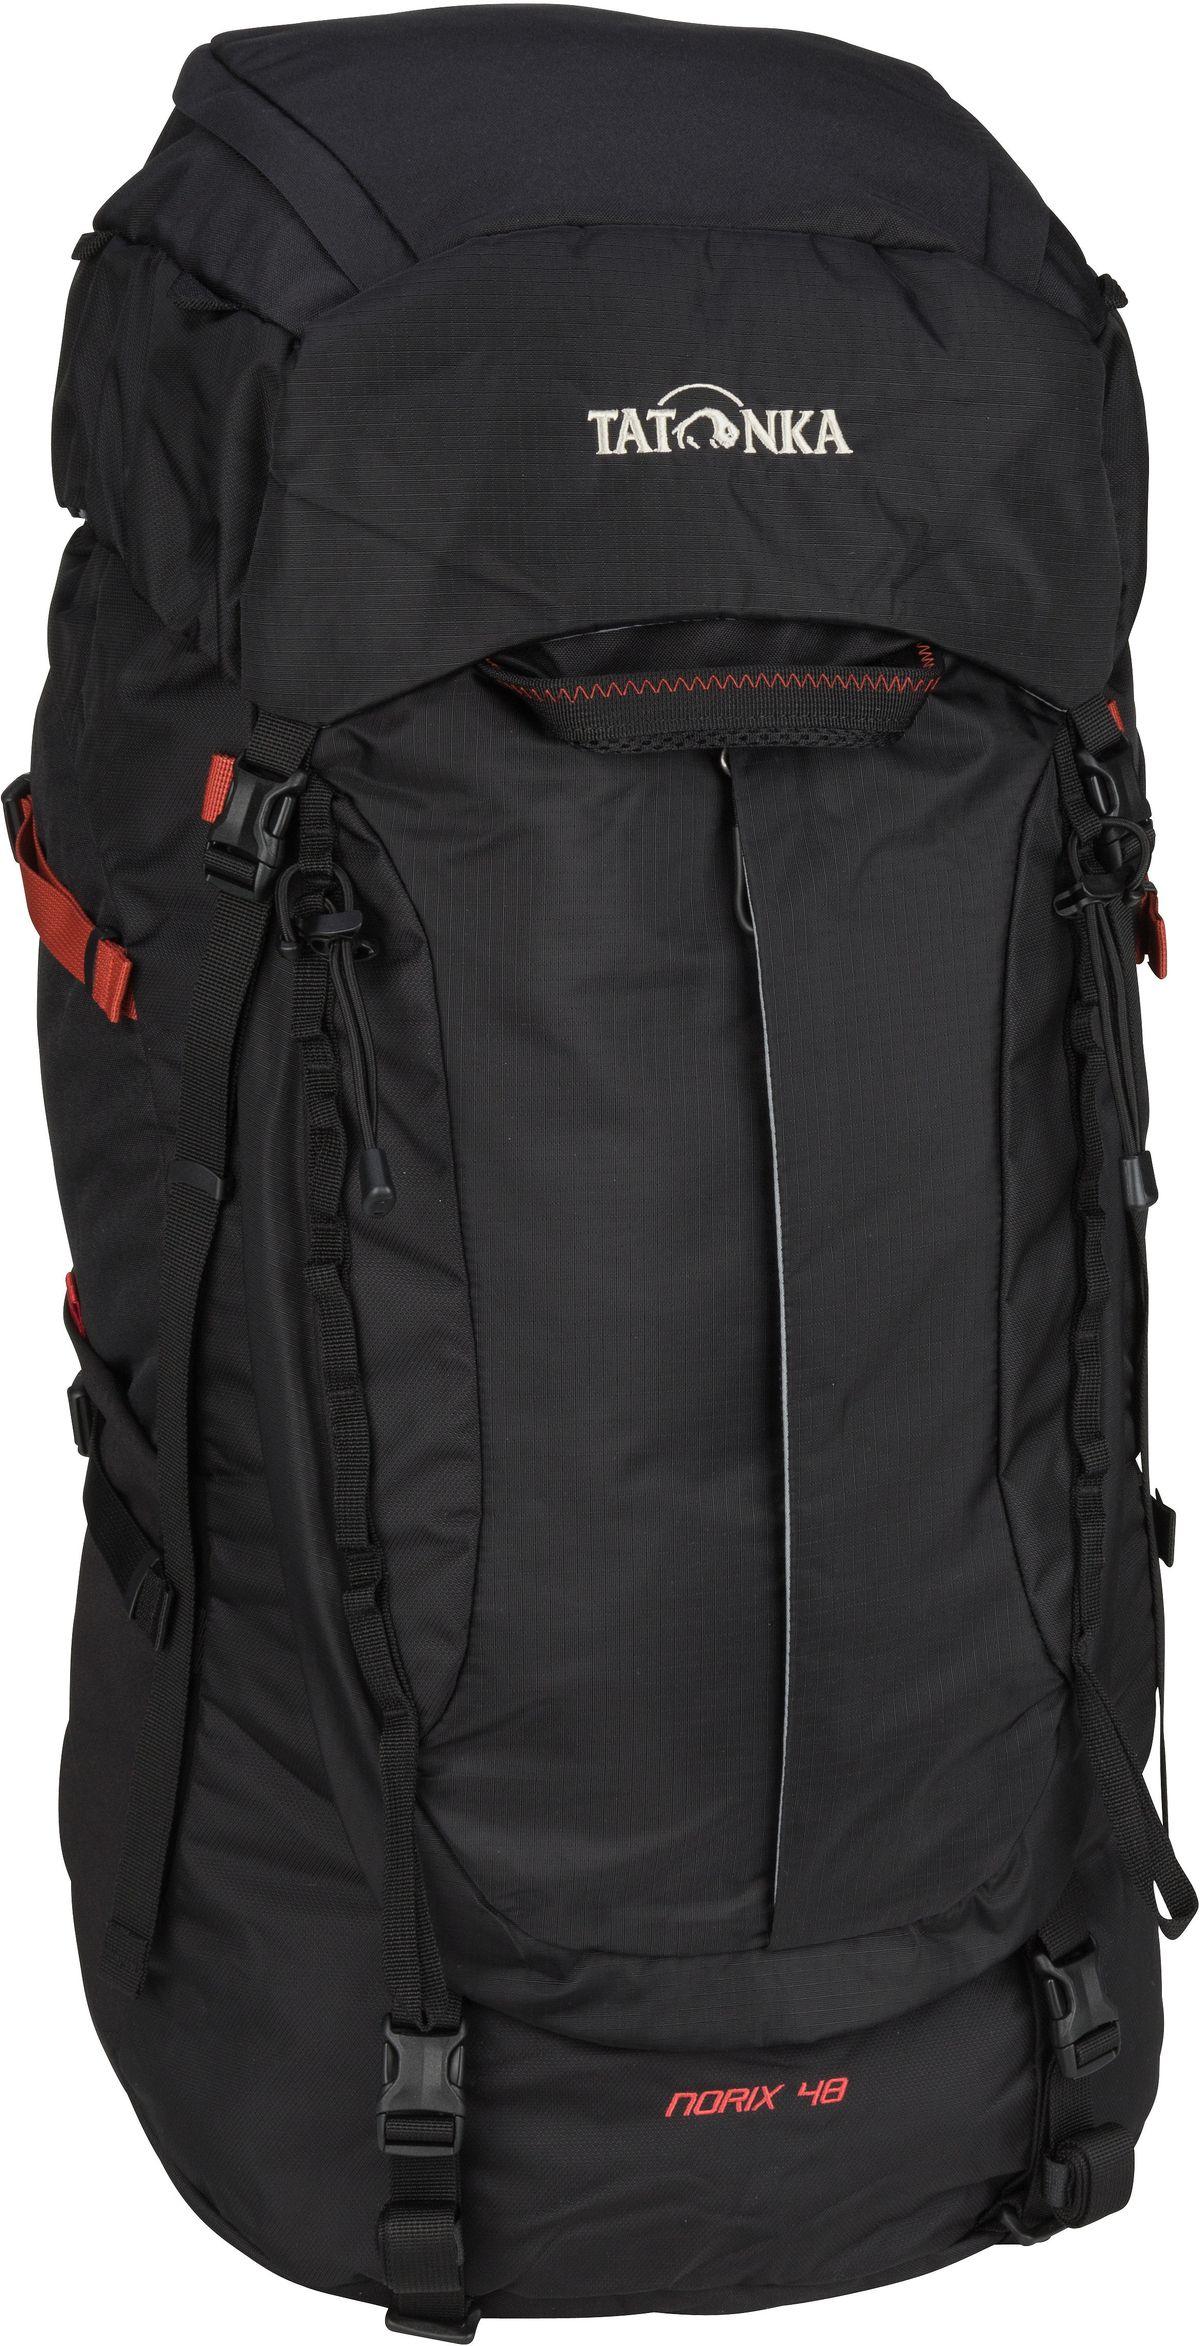 Trekkingrucksack Norix 48 Black (48 Liter)